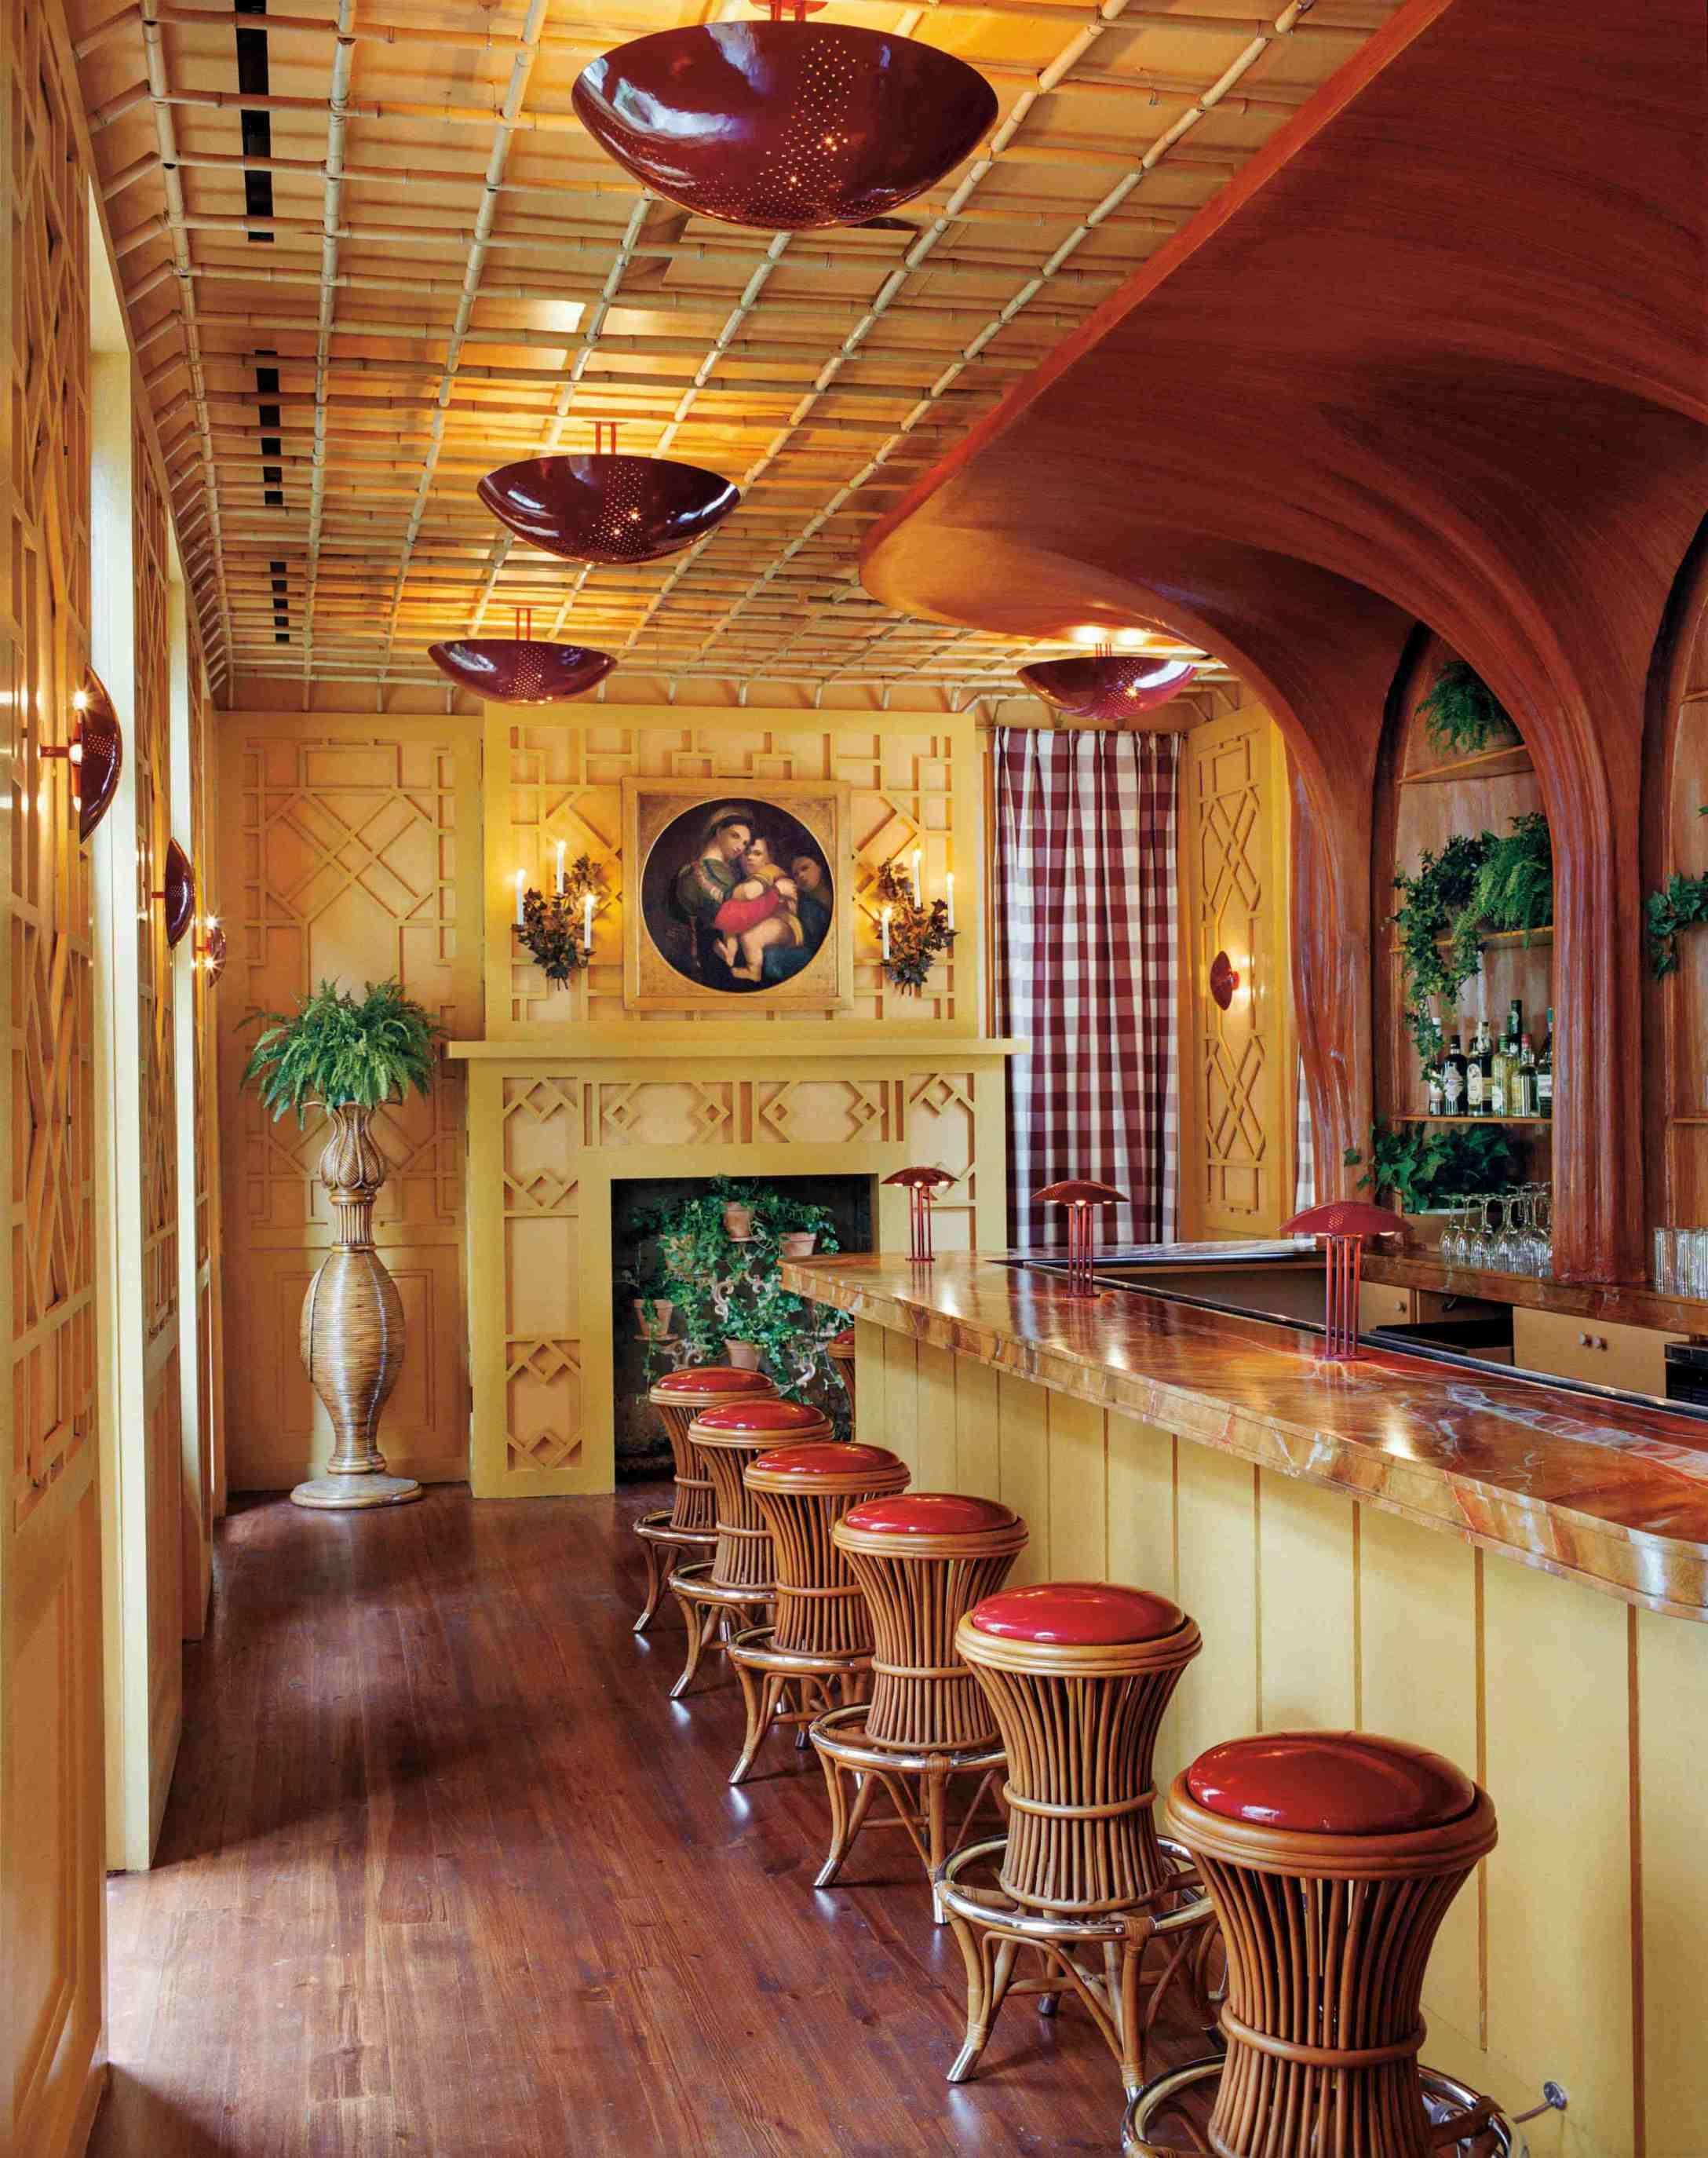 Hotel Peter Paul S Elysian Bar New Orleans In 2020 Hotel Bar